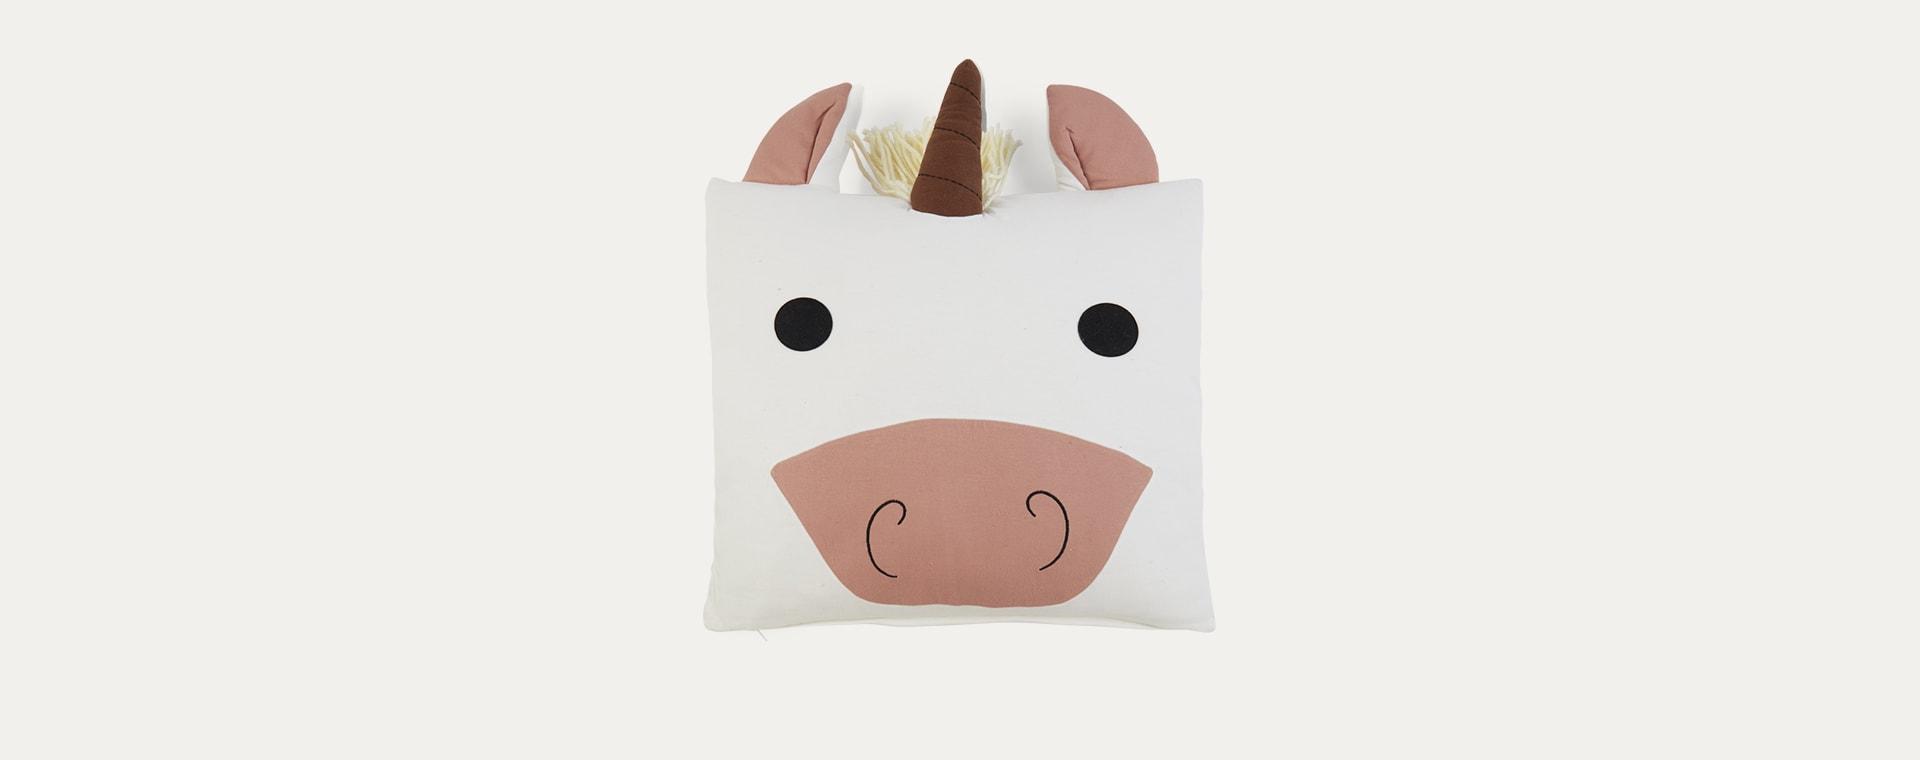 Ziva Unicorn Kids Depot Animal Cushion